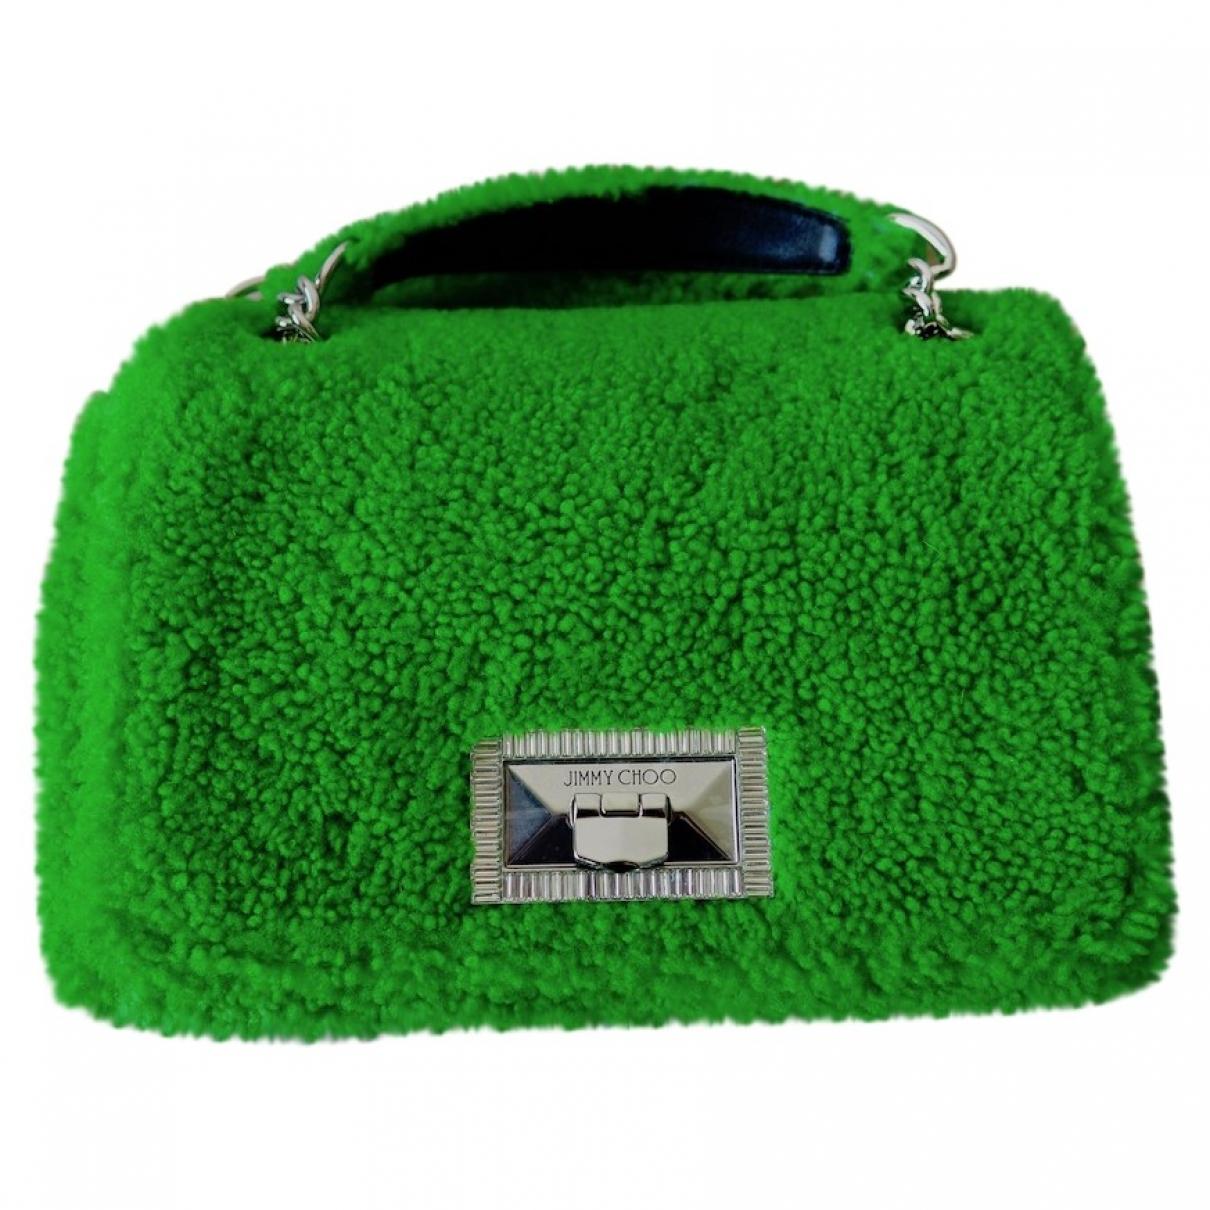 Jimmy Choo \N Green handbag for Women \N